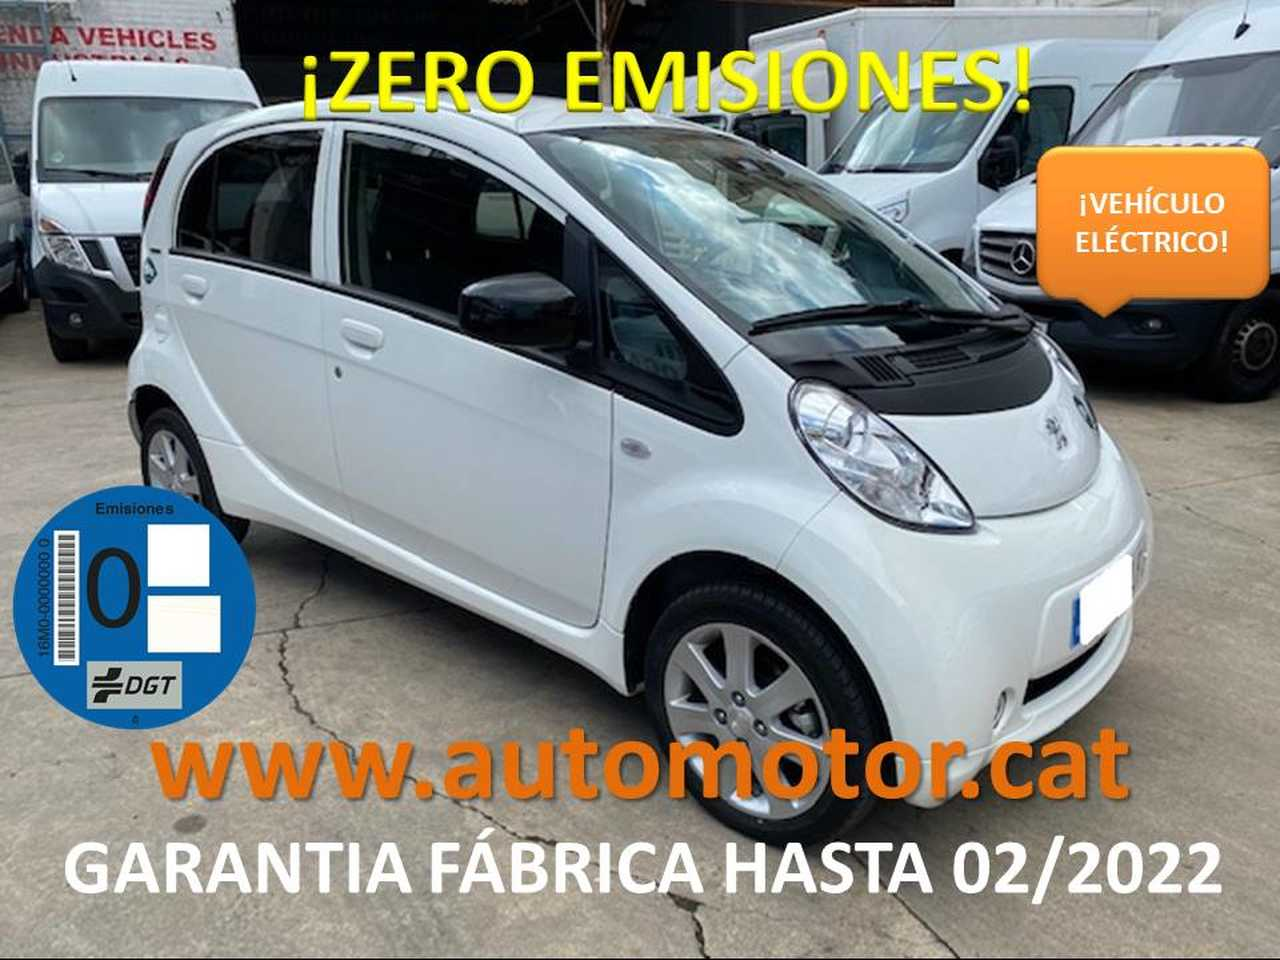 Peugeot iOn Eléctrico GARANTIA FABRICA 02/2022  - Foto 1